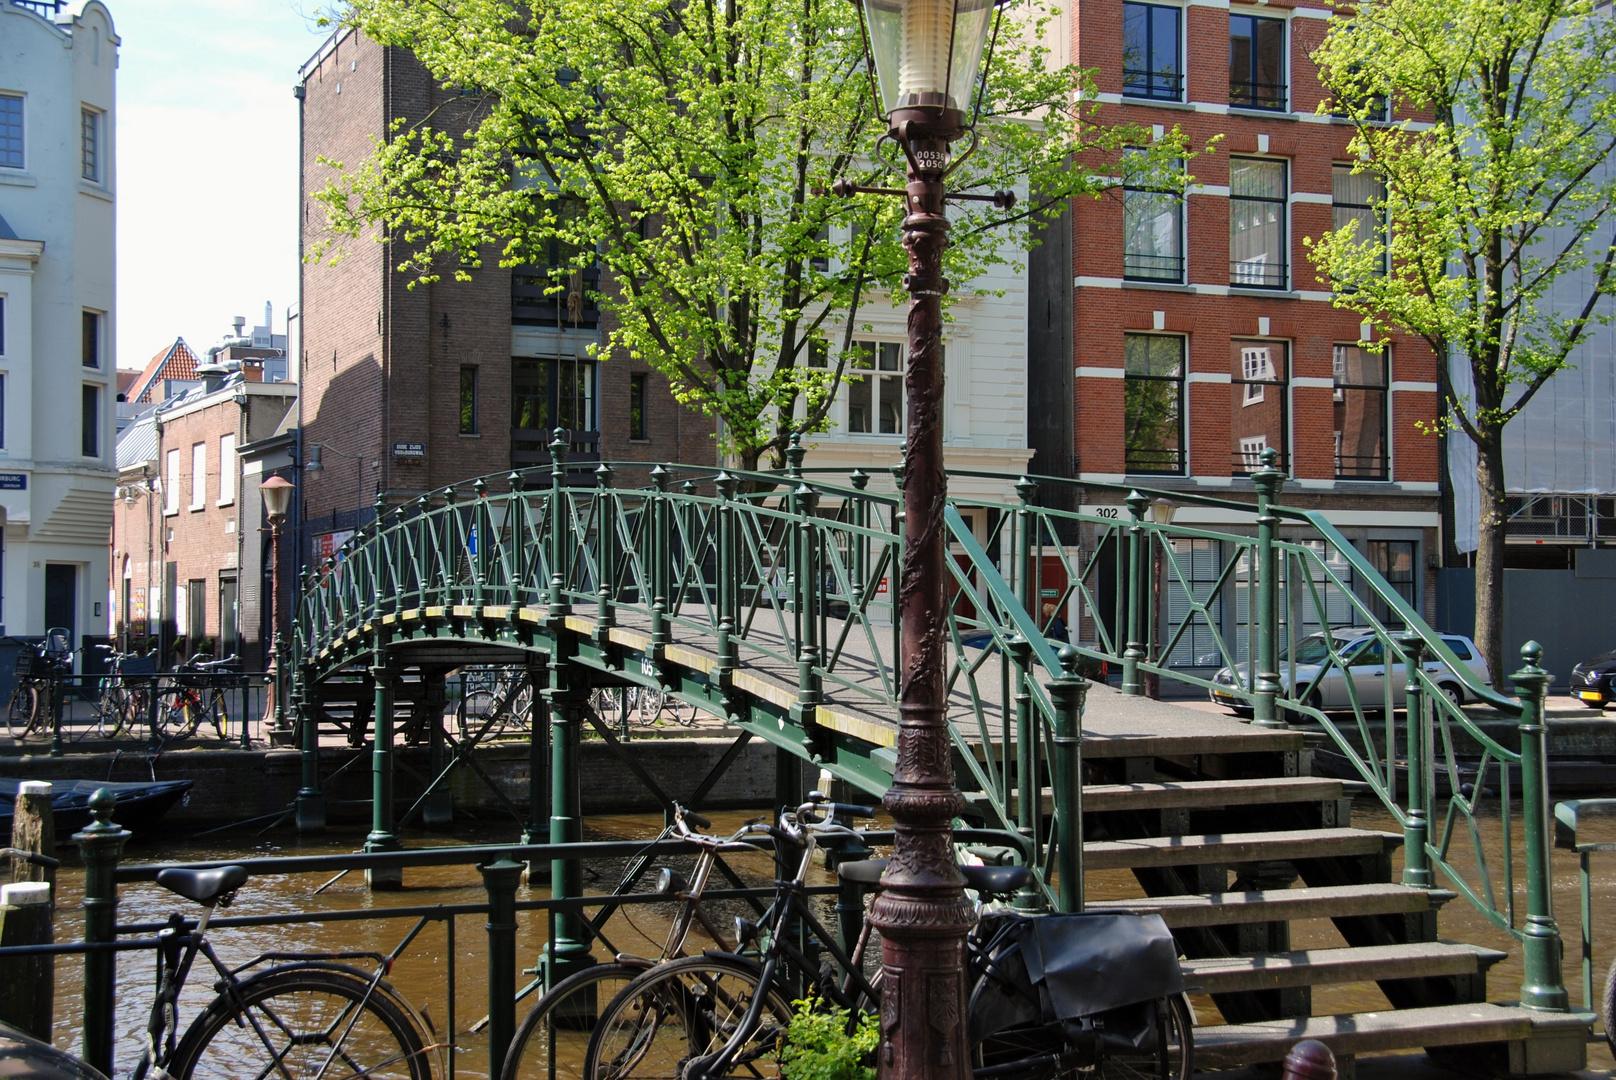 die Brücke über die Gracht